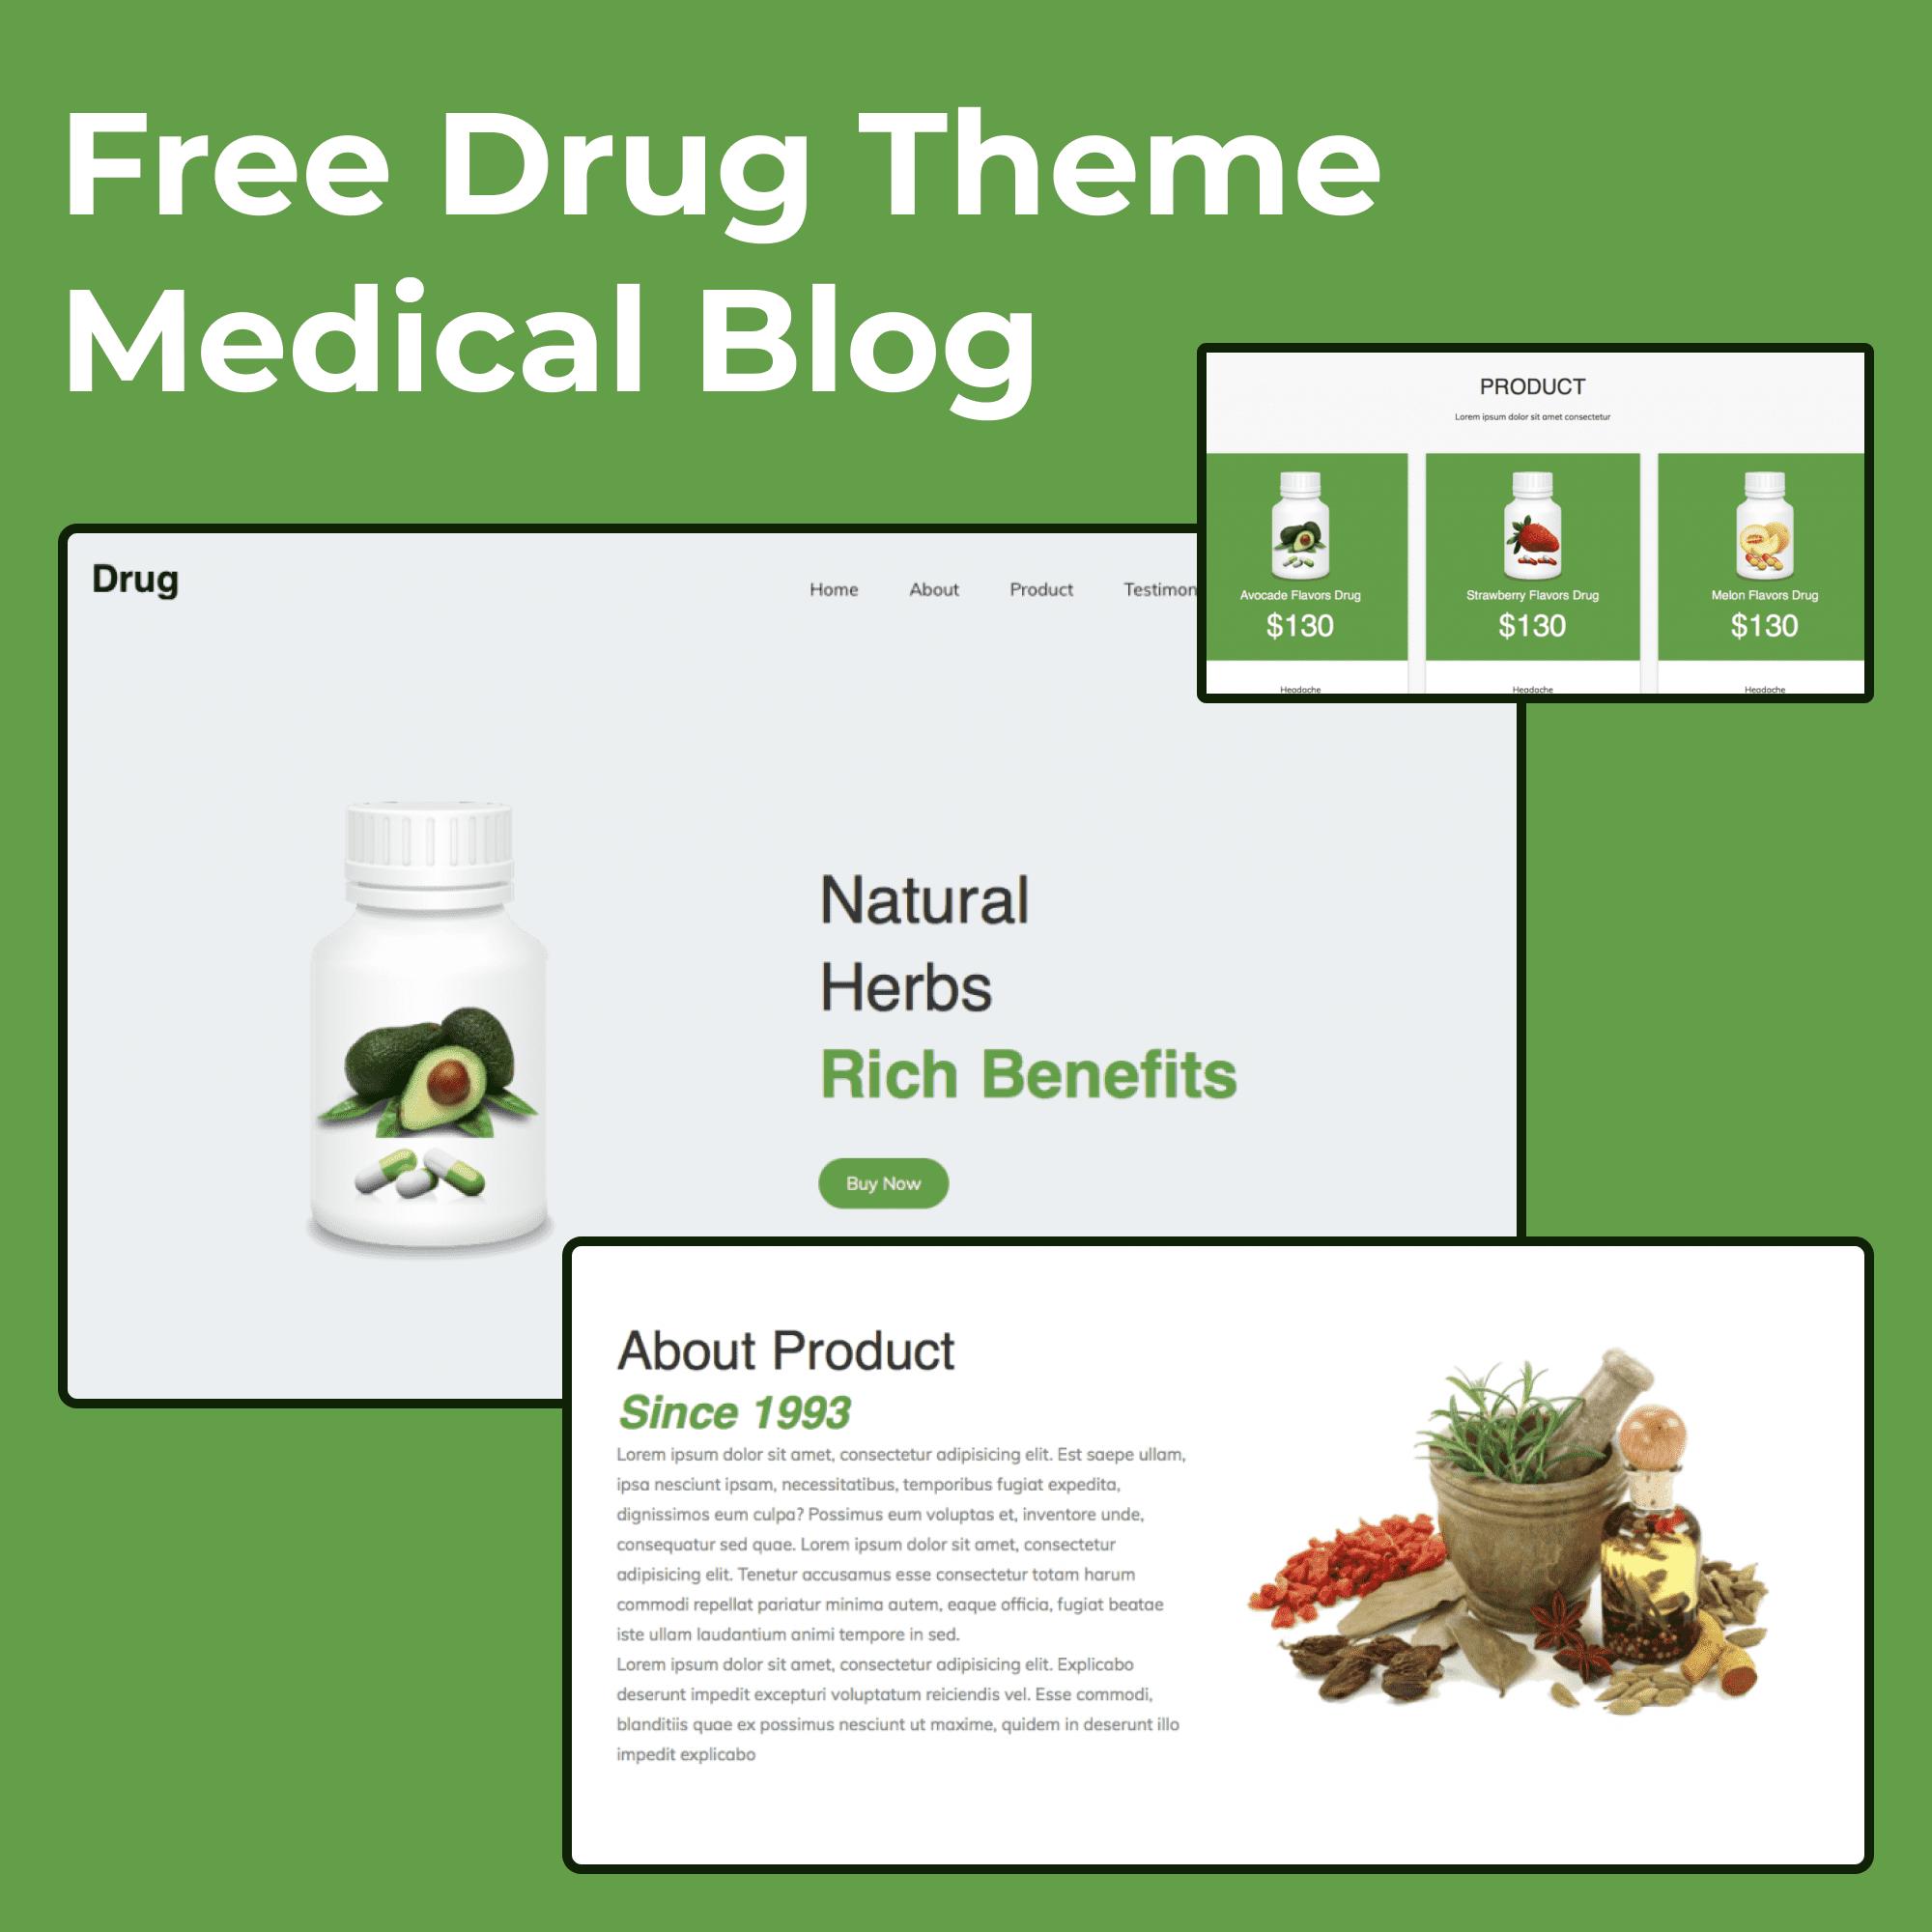 Free Drug Theme Medical Blog main image